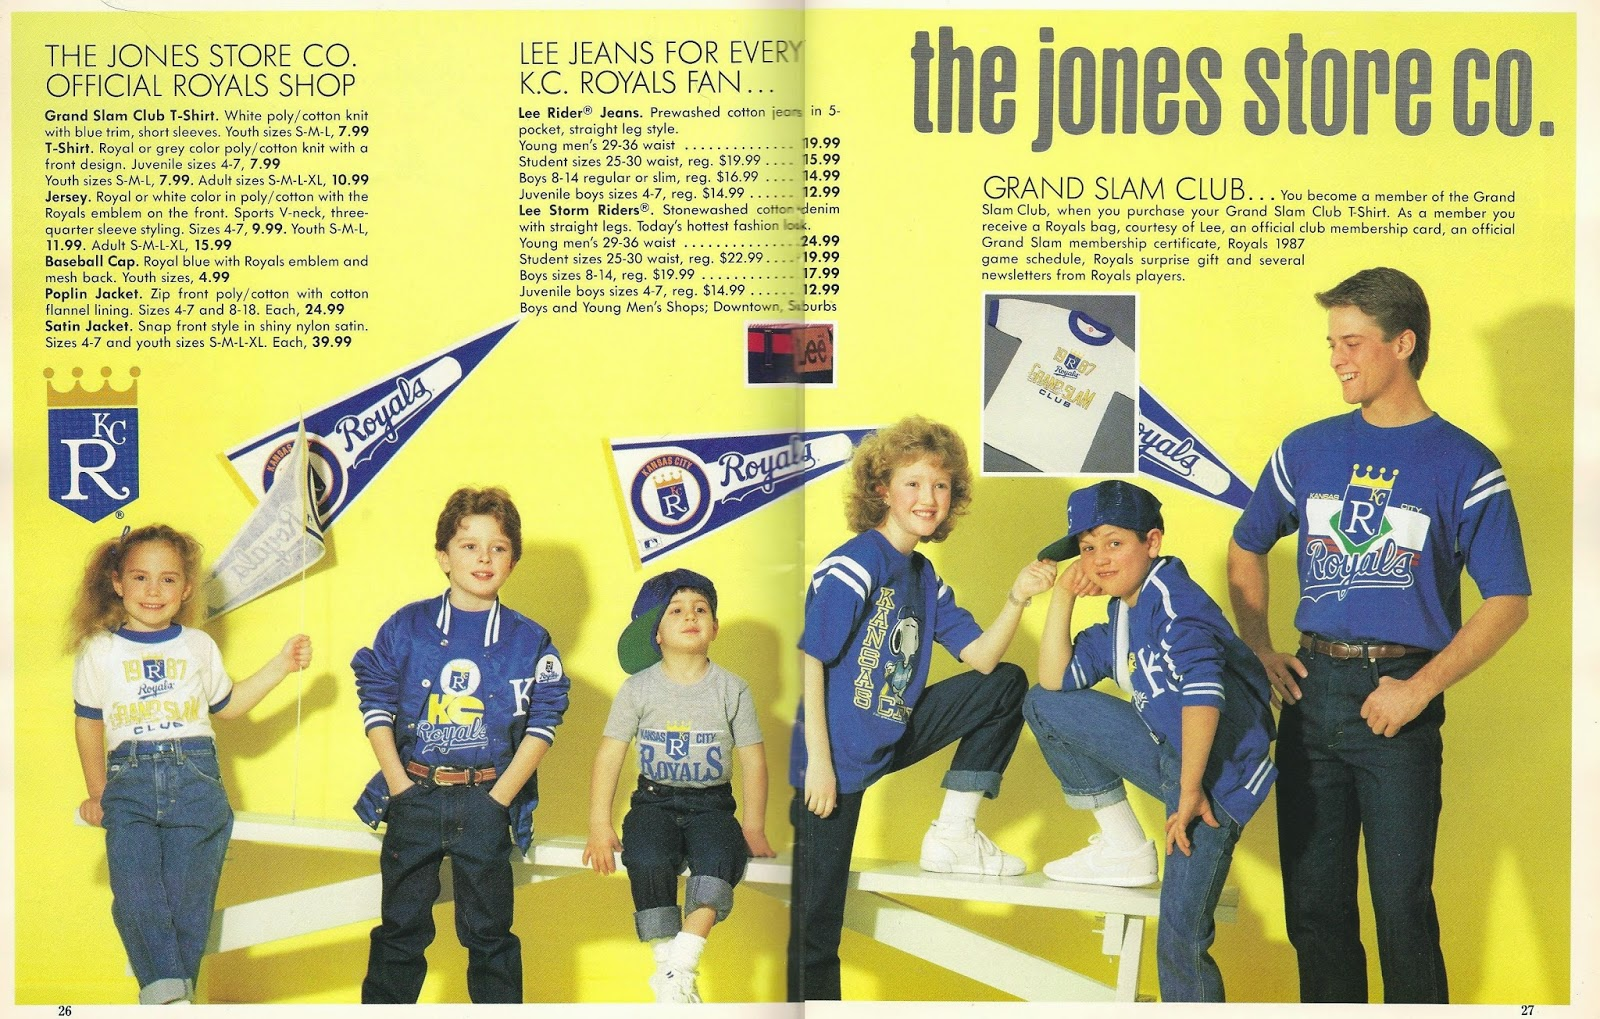 http://2.bp.blogspot.com/-Y99jJay38Cc/U9fFYMOBbnI/AAAAAAAANHU/hJ0ZhL0u6JA/s1600/1987-royals-jones-store-ad.jpg